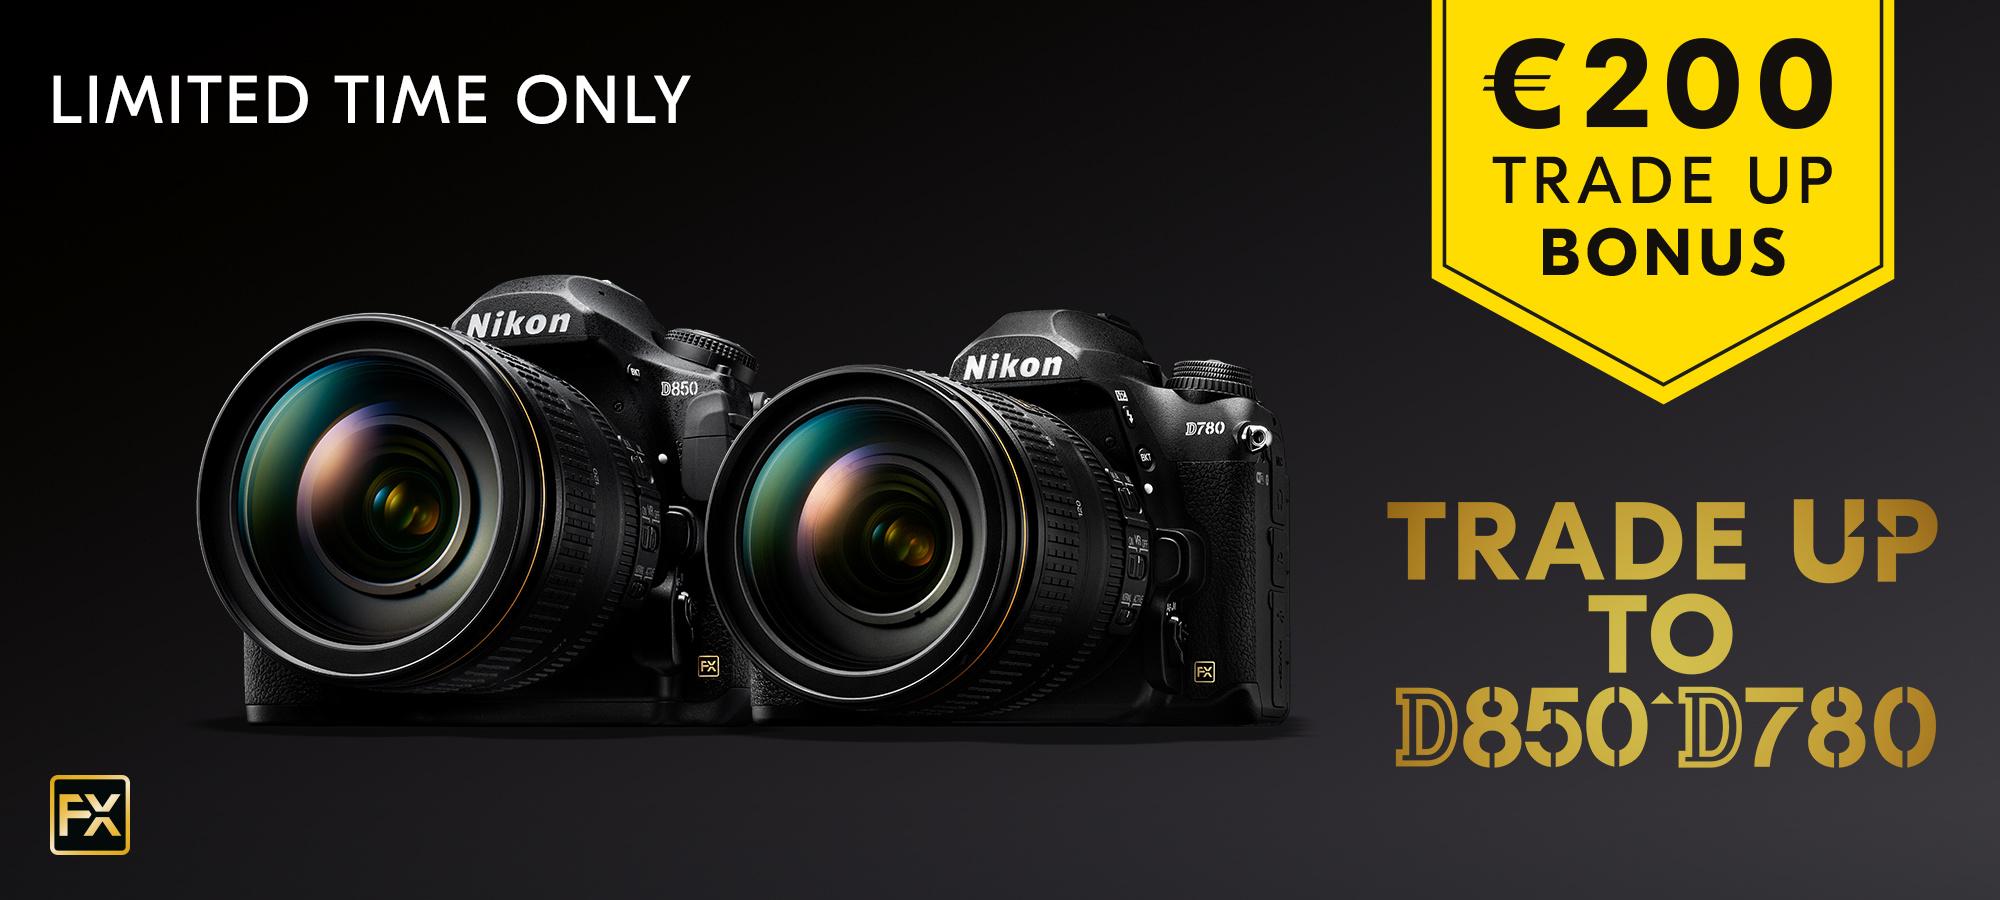 Nikon D850 promo